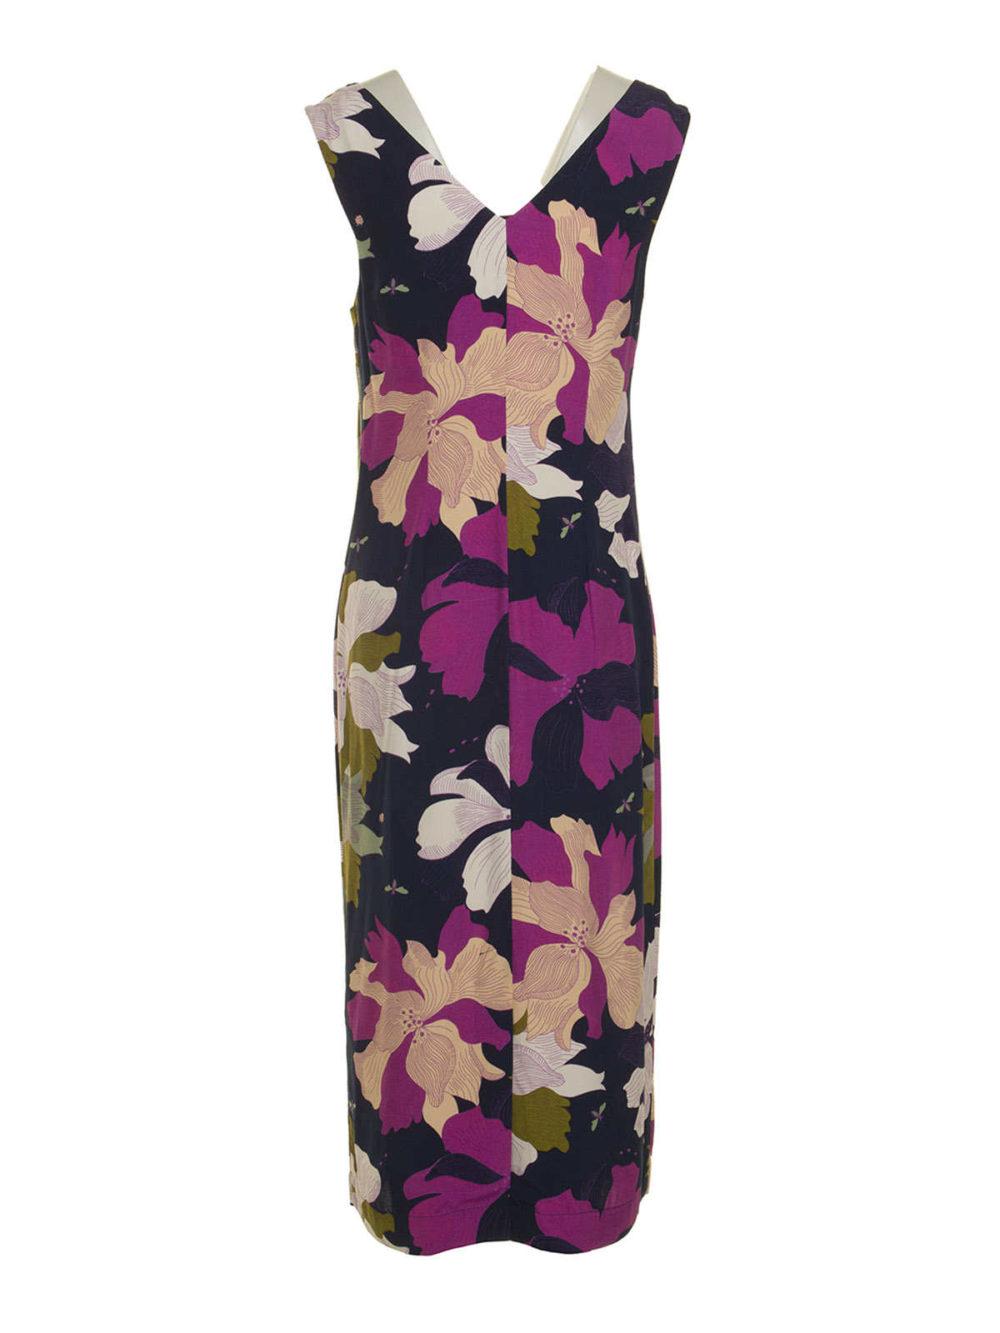 Big Nature Print Dress Nice Things Katie Kerr Women' Clothing